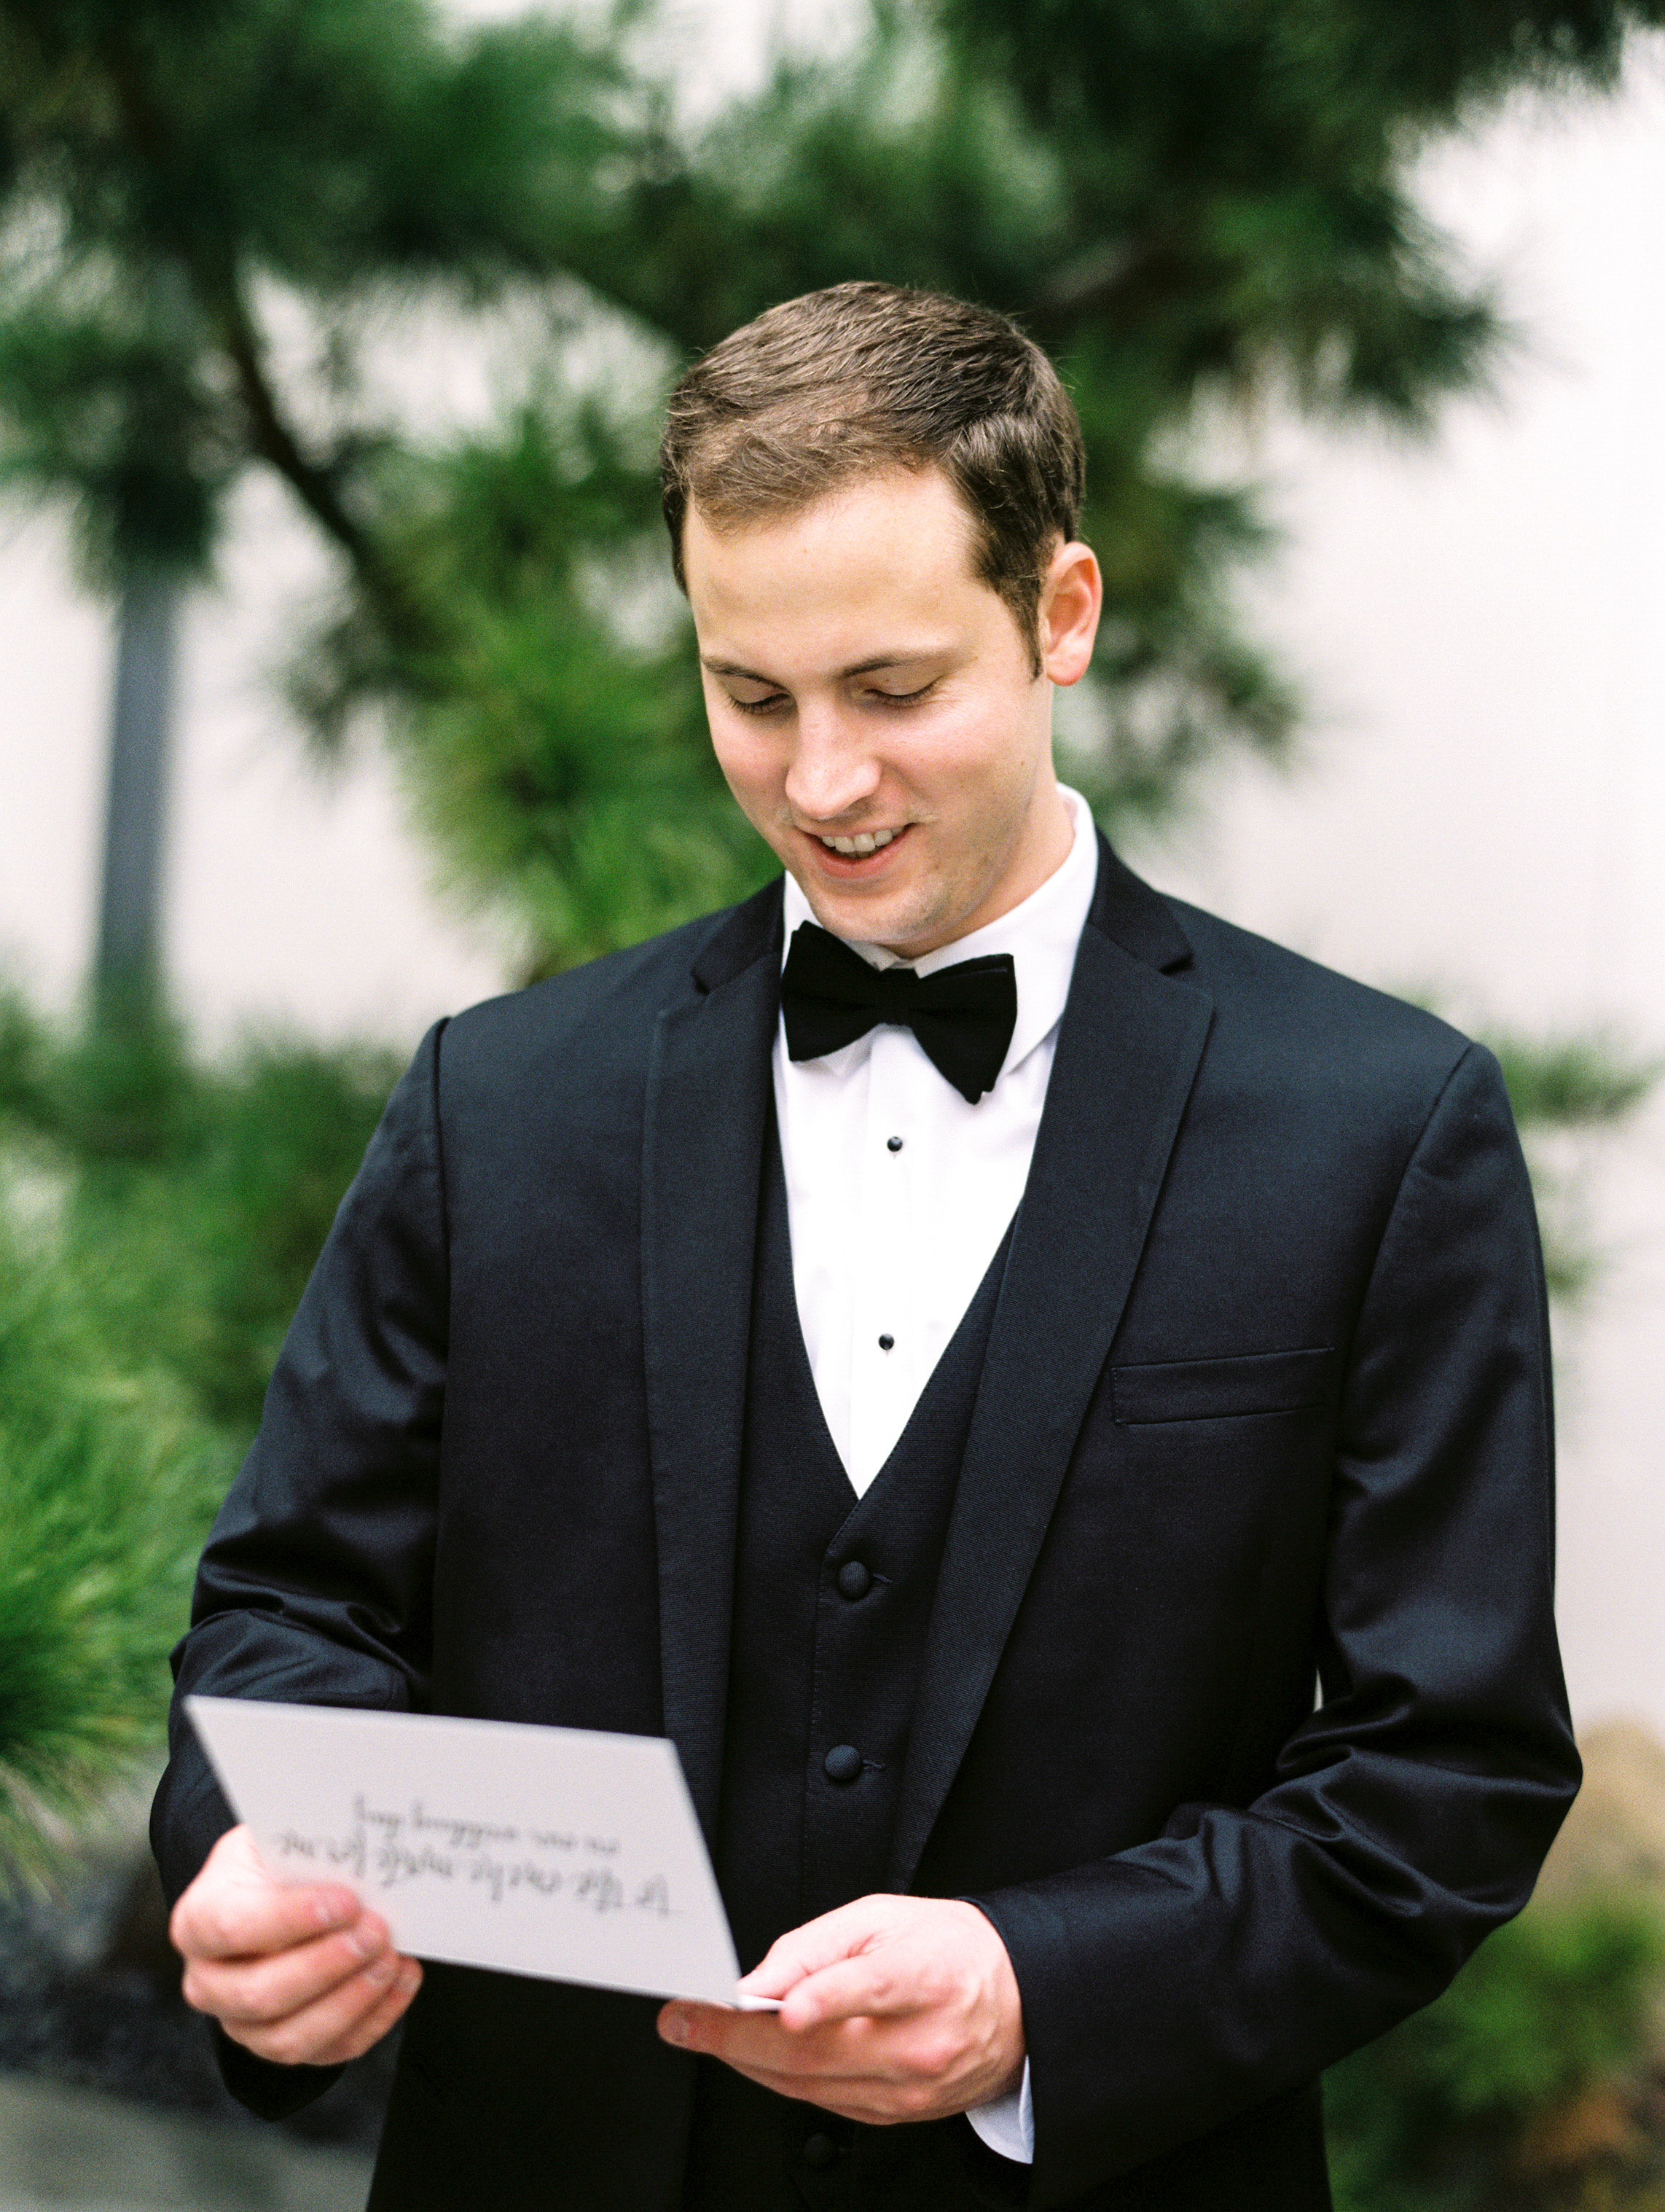 Dana-Fernandez-Photography-Weddings-in-Houston-Magazine-feature-Houston-wedding-photographer-film-17.jpg